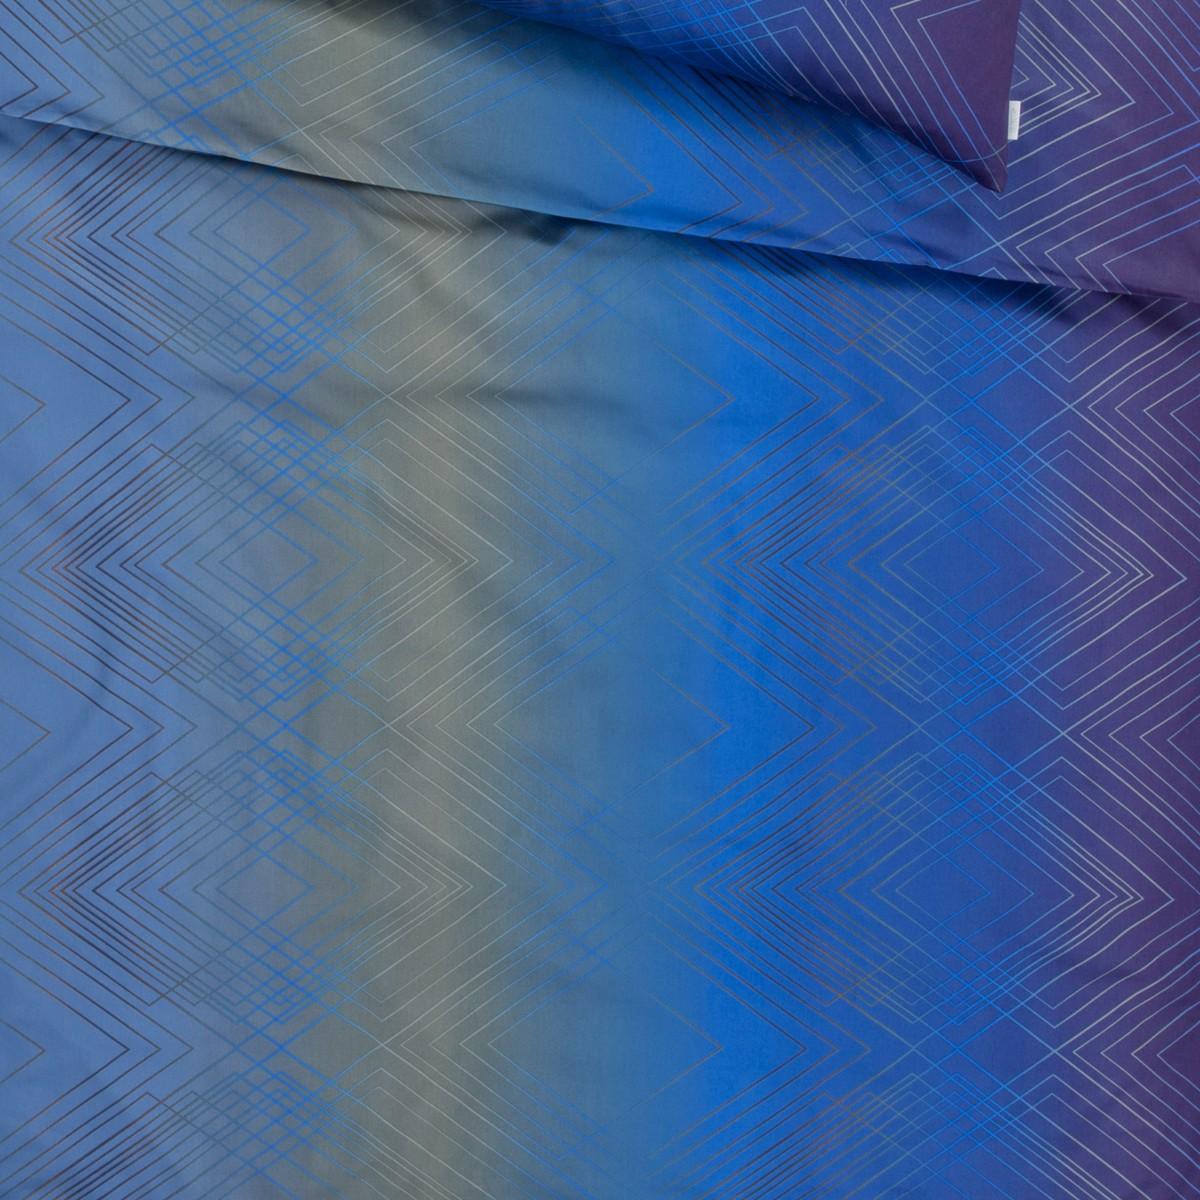 mako satin bettw sche estella franjo nachtblau bettw sche mako satin bettw sche. Black Bedroom Furniture Sets. Home Design Ideas